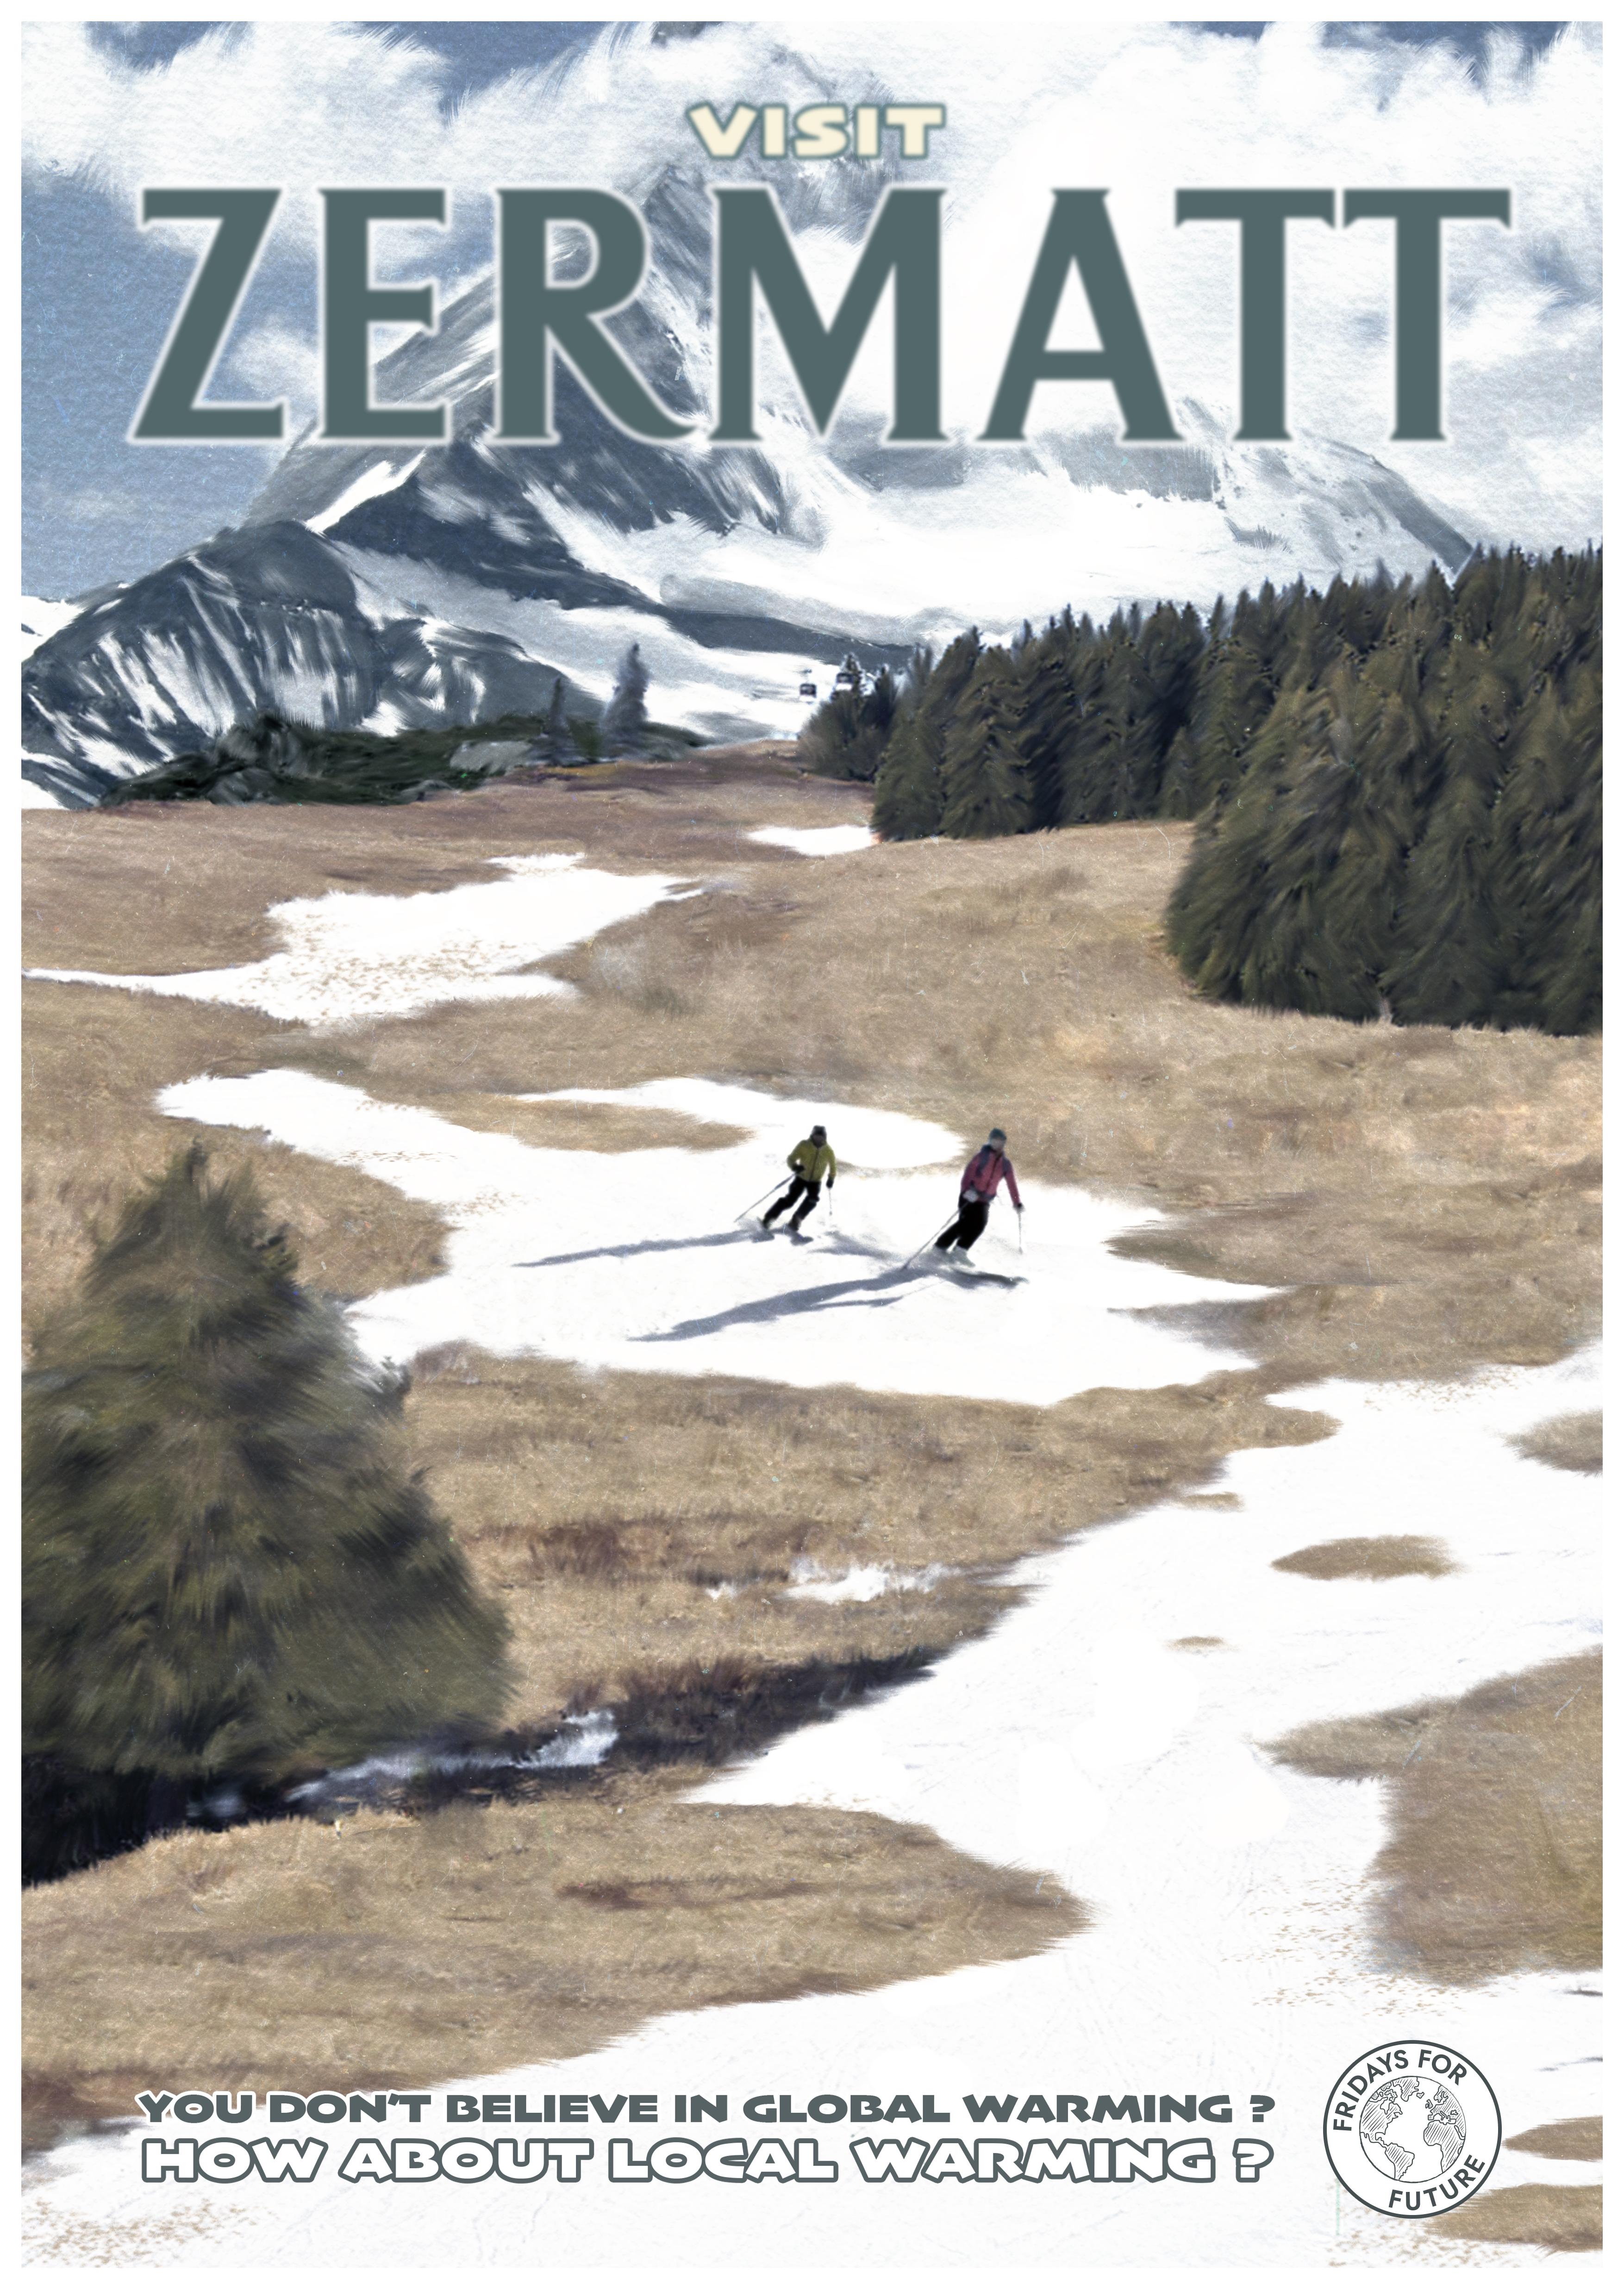 Fridays for Future: Zermatt